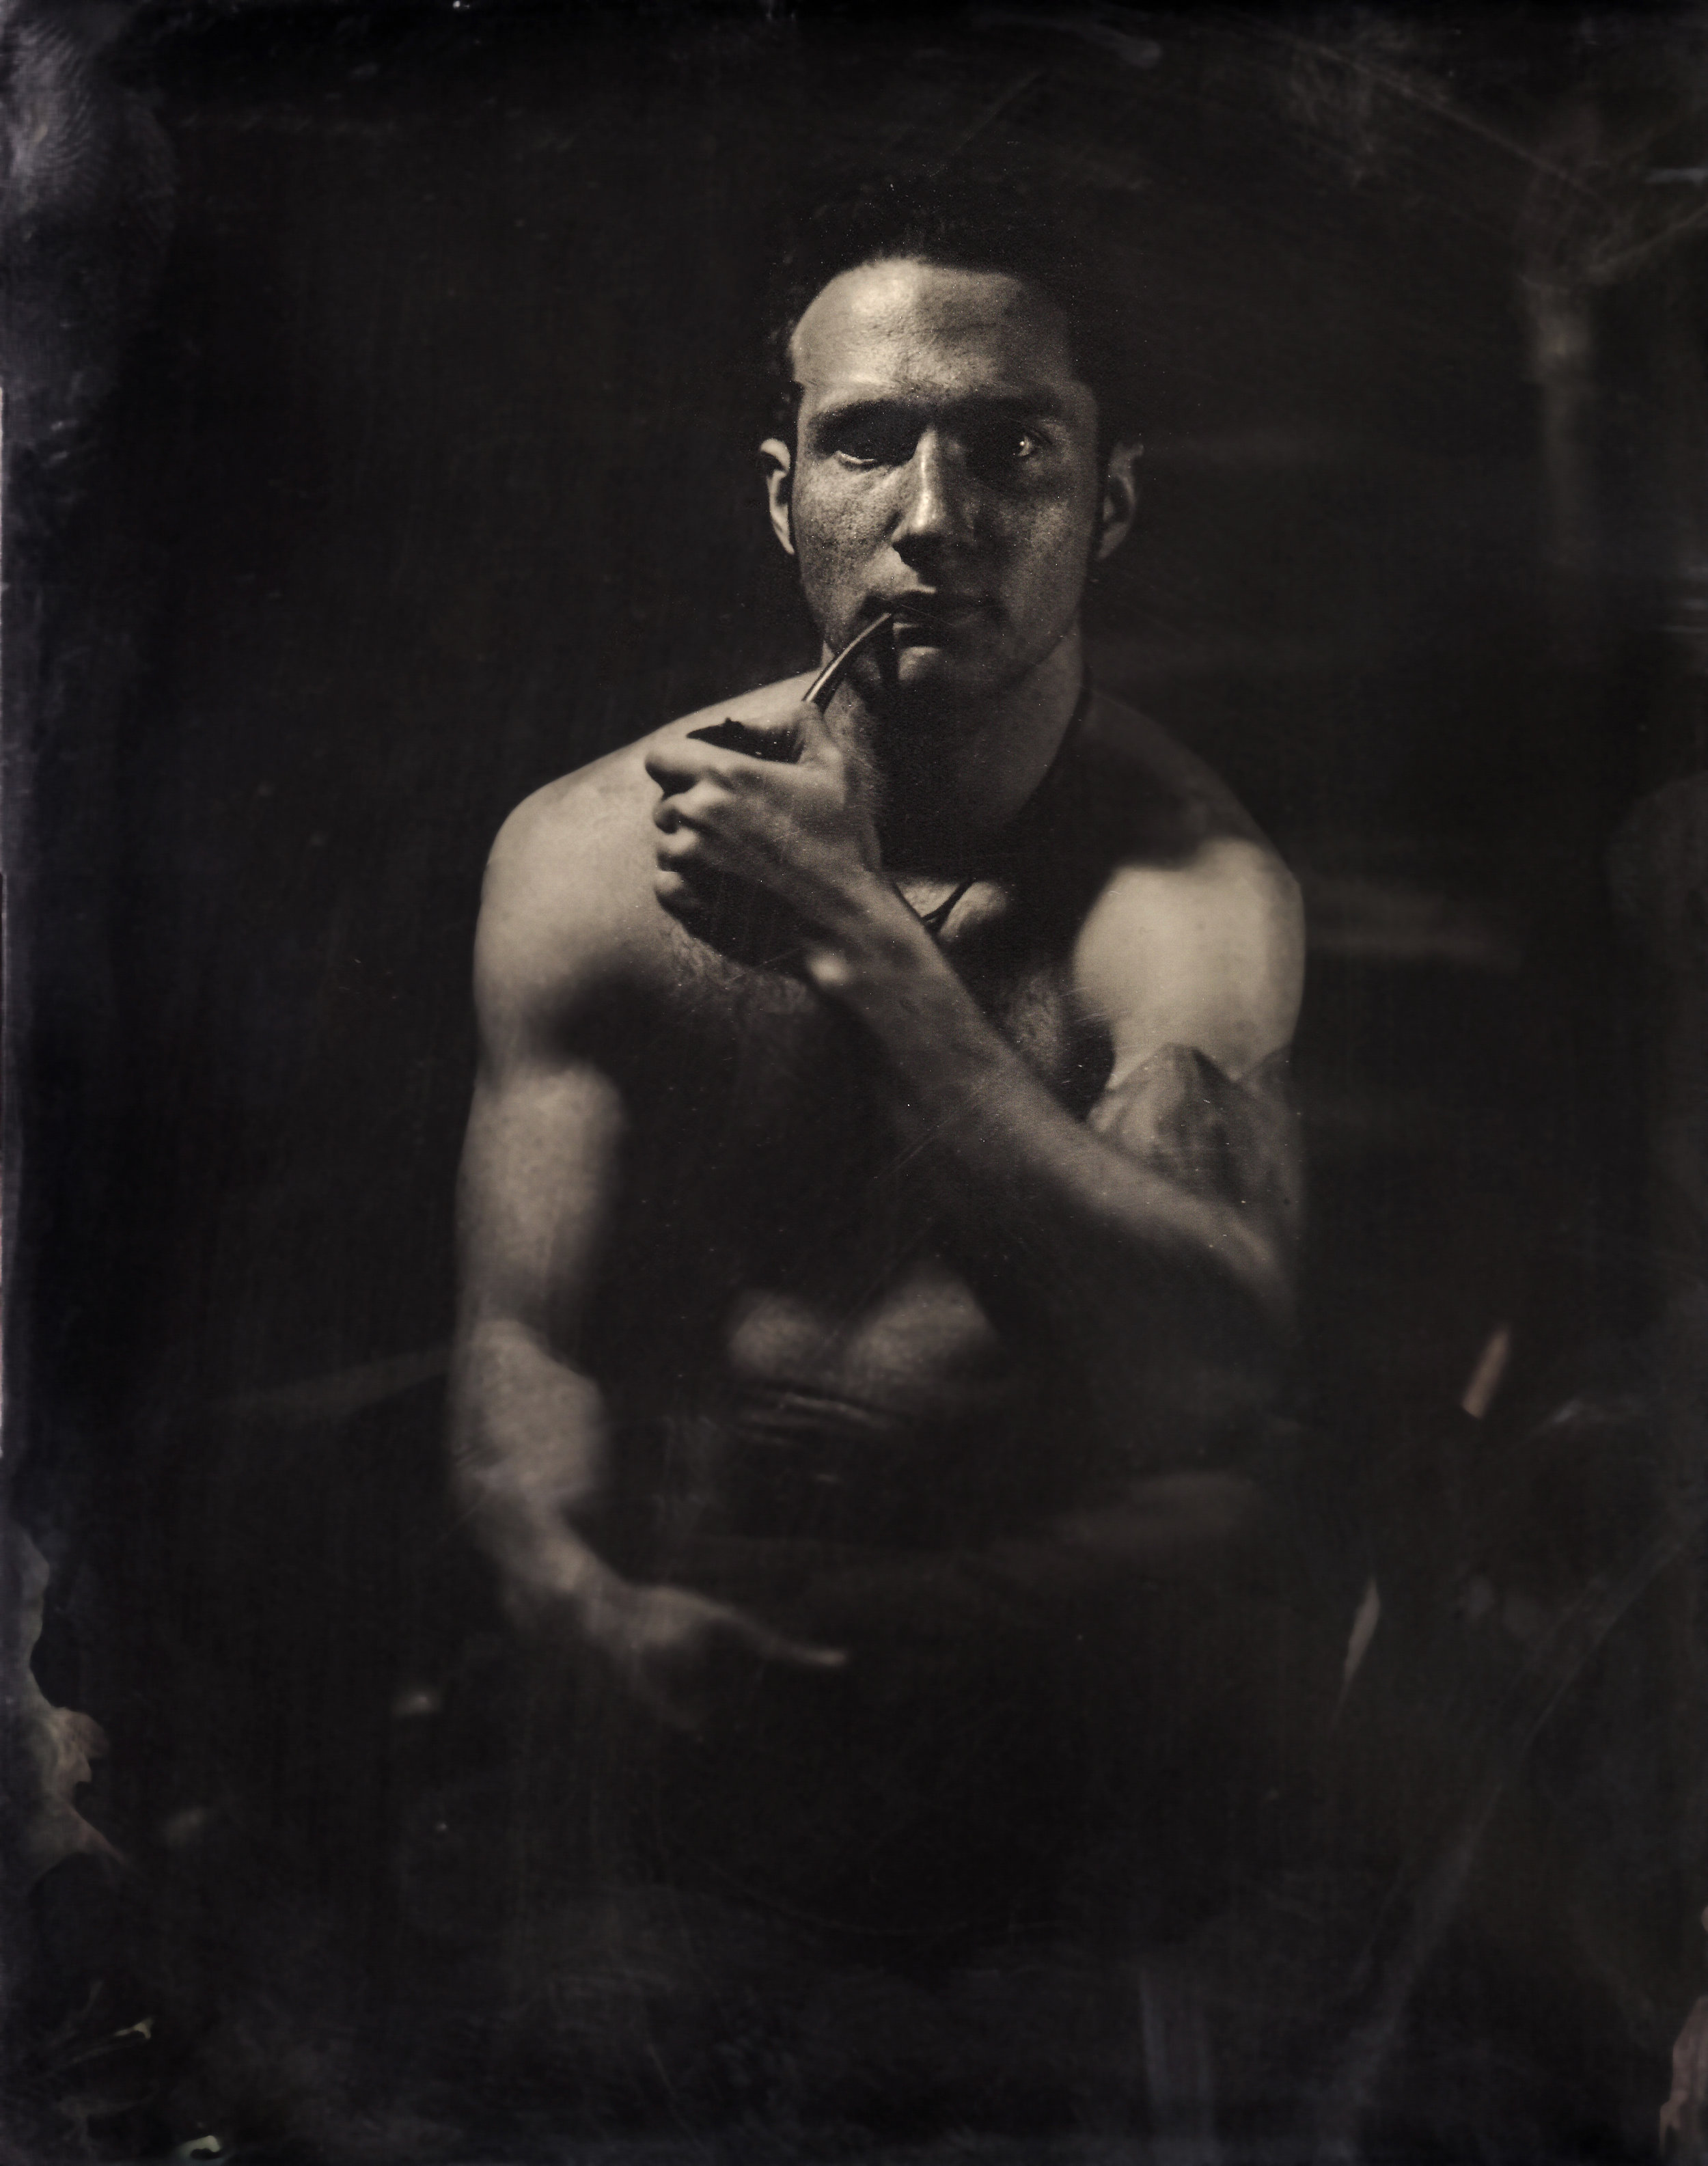 Tintype Civil War photographer Lansing Michigan Steven Glynn